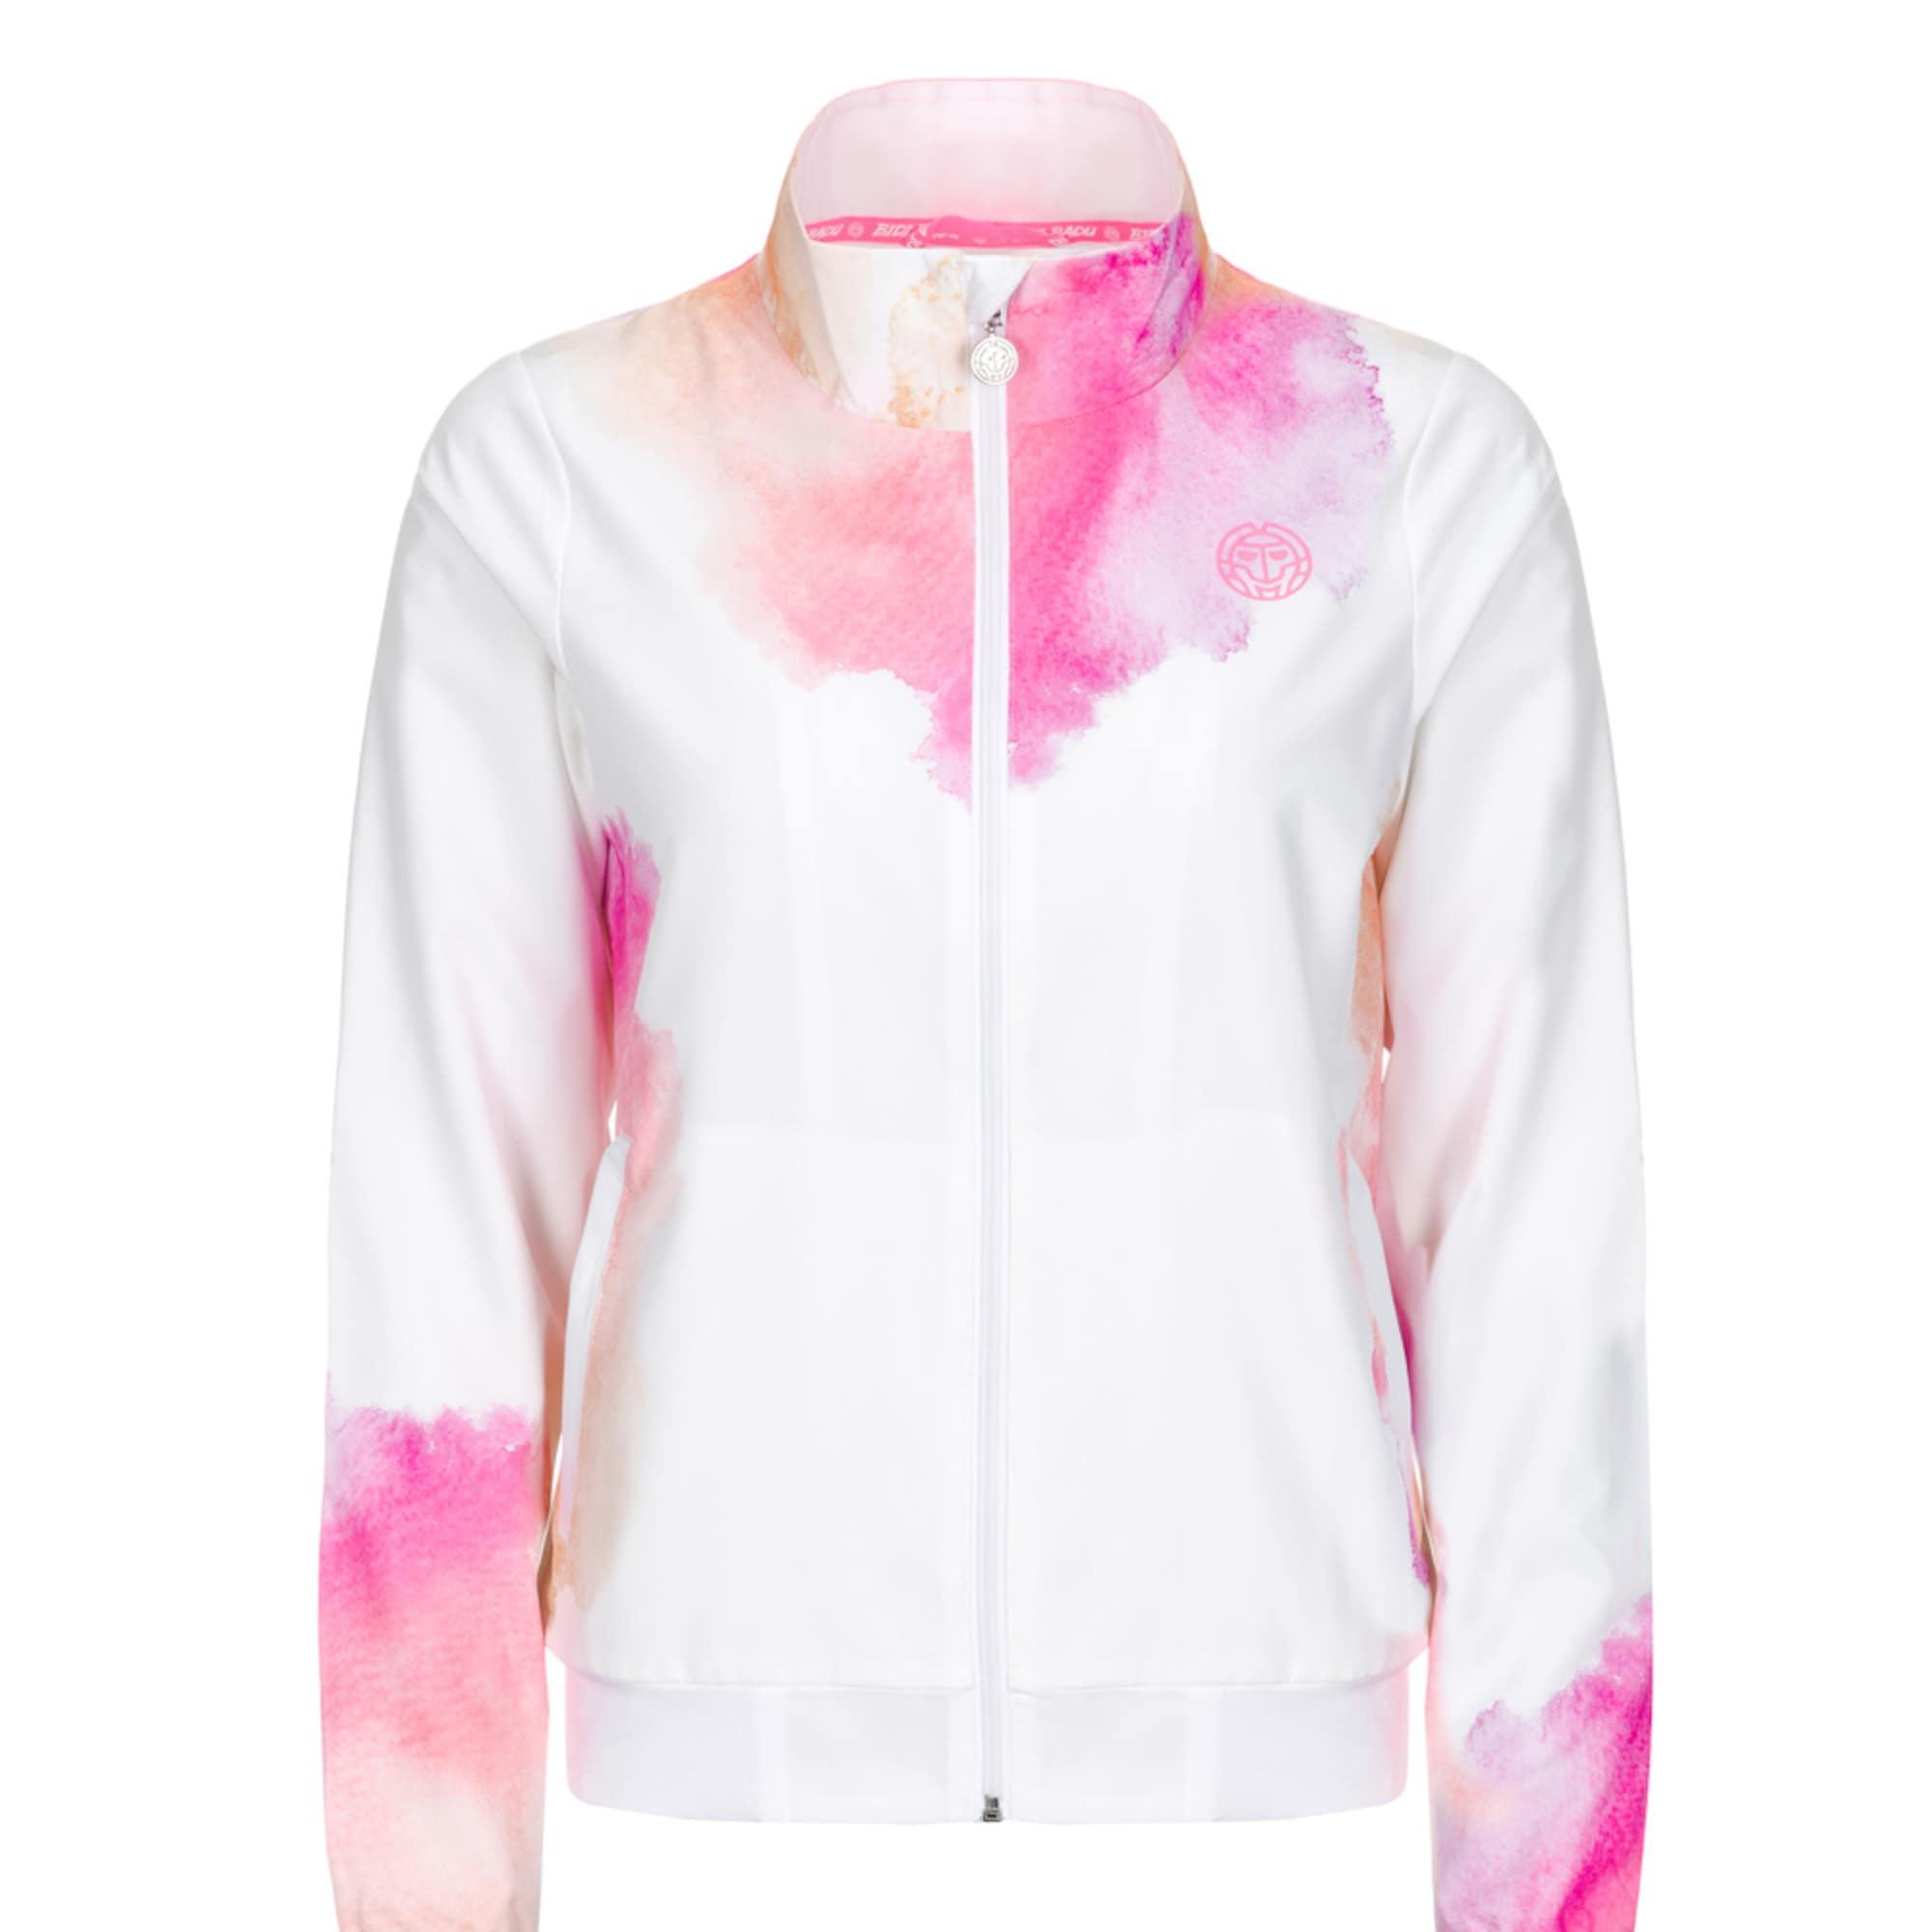 Trainingsjacke | Sportbekleidung > Sportjacken > Trainingsjacken | Pink - Weiß | BIDI BADU